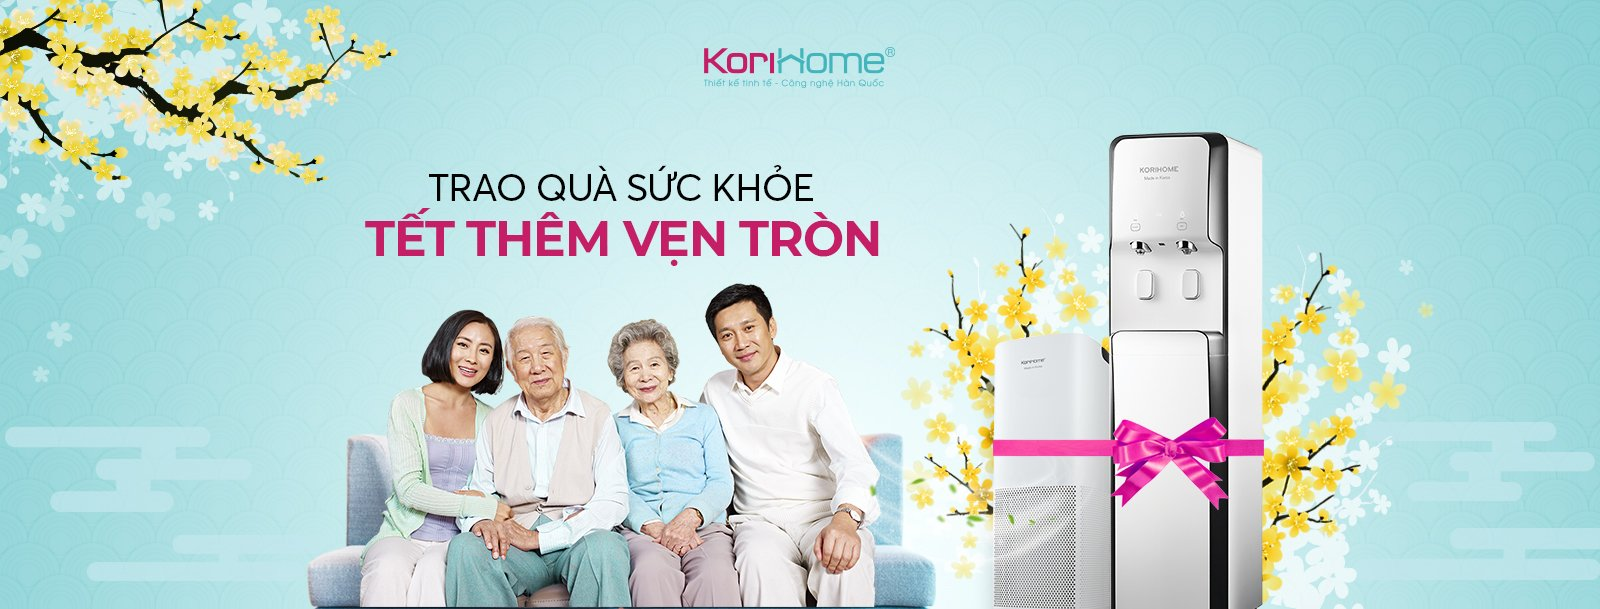 korihome-cam-on-vi-da-dong-hanh-trong-suot-365-ngay-vua-qua-3